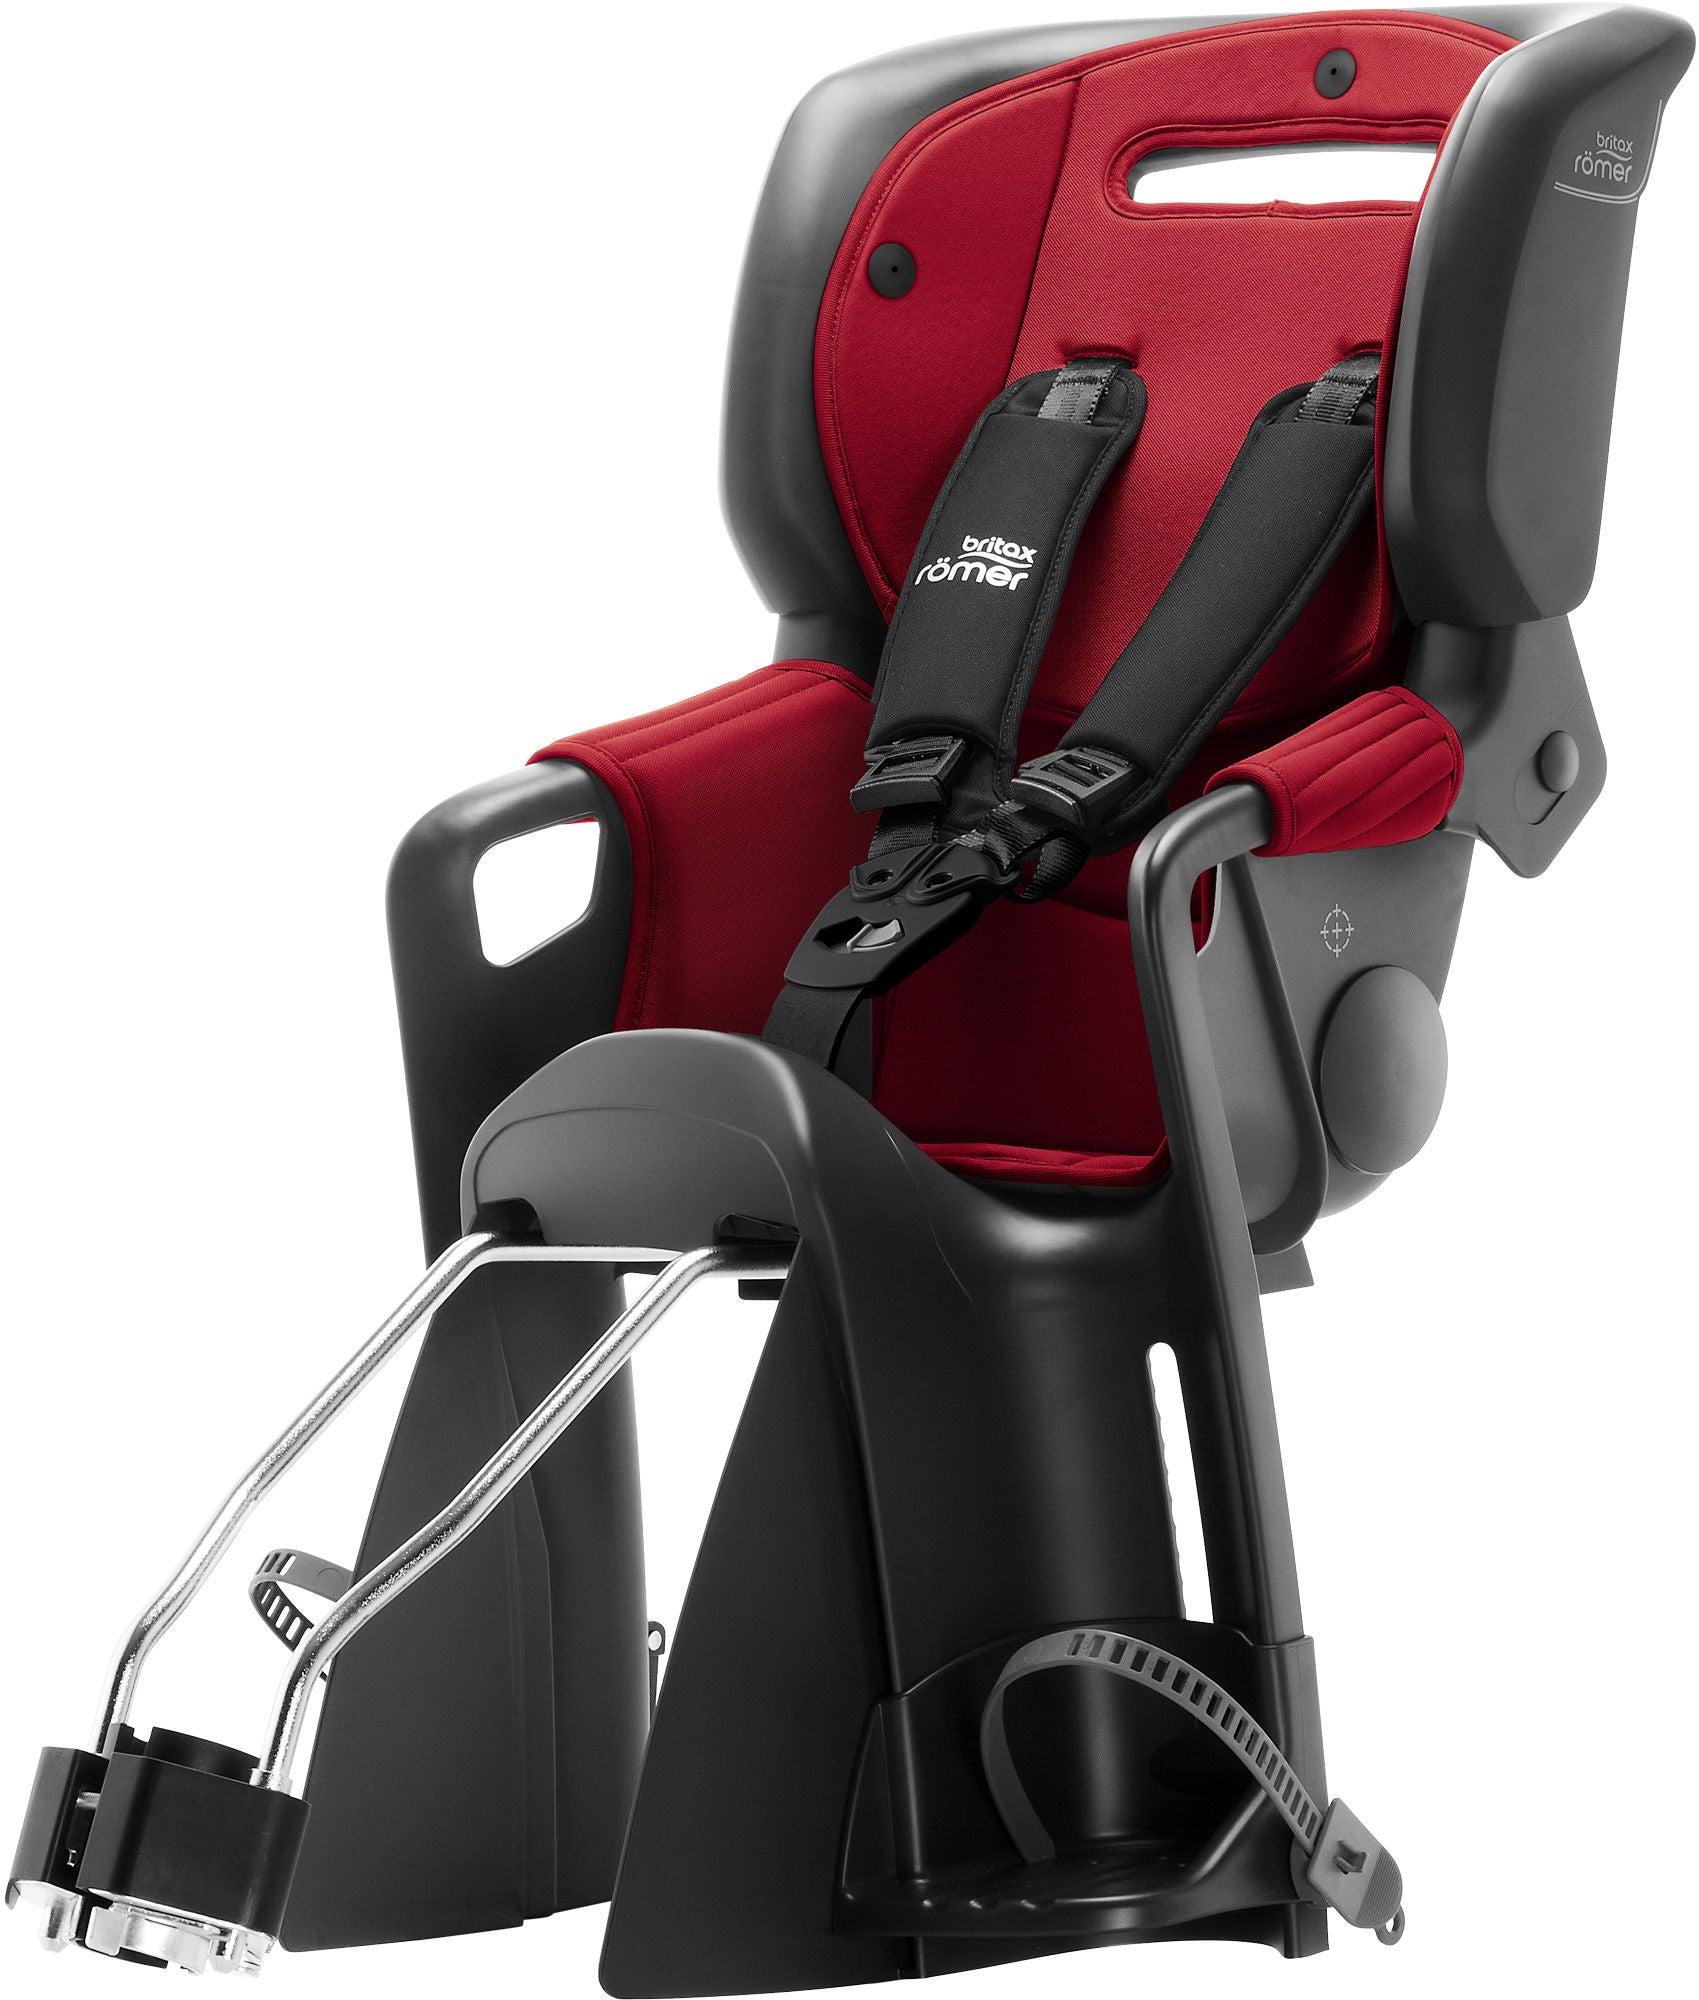 Britax Römer Jockey³ Comfort Cykelstol, Red/Blue | Bike seat